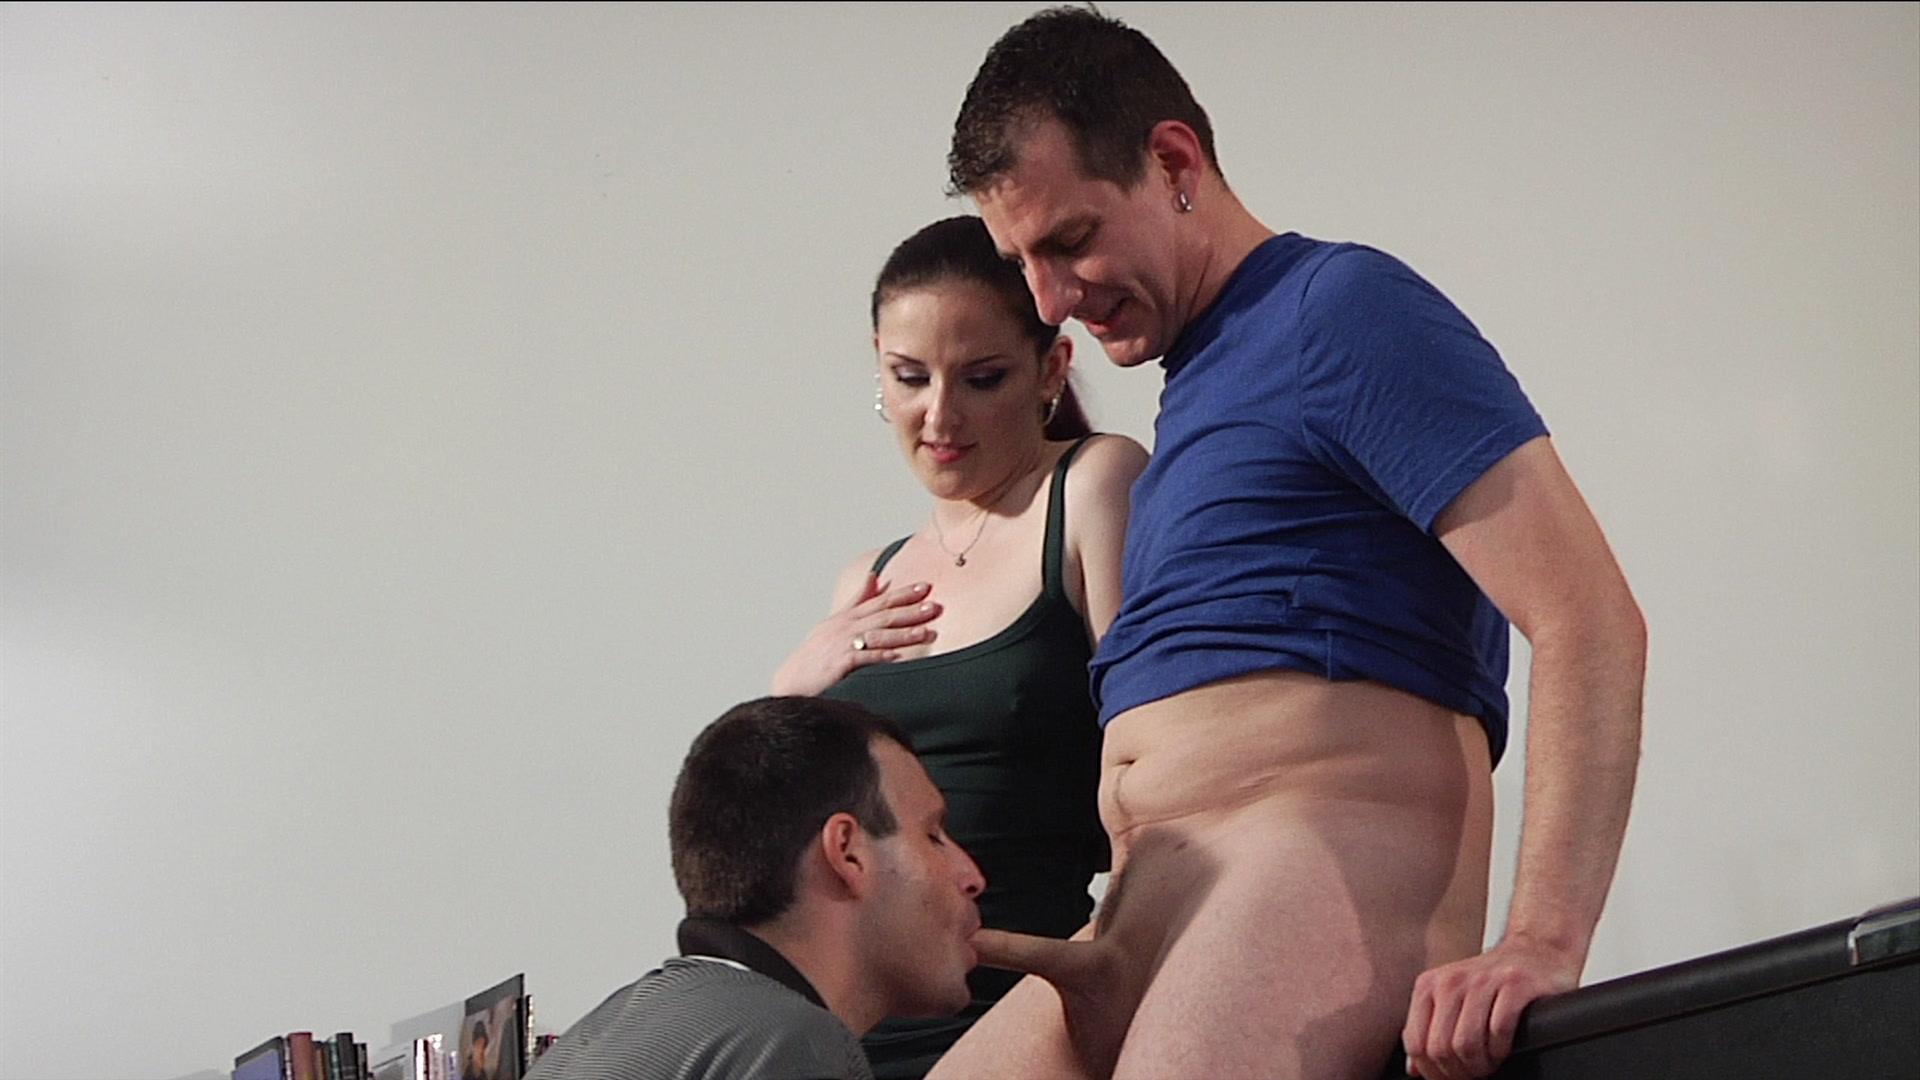 gay suck cock bet video